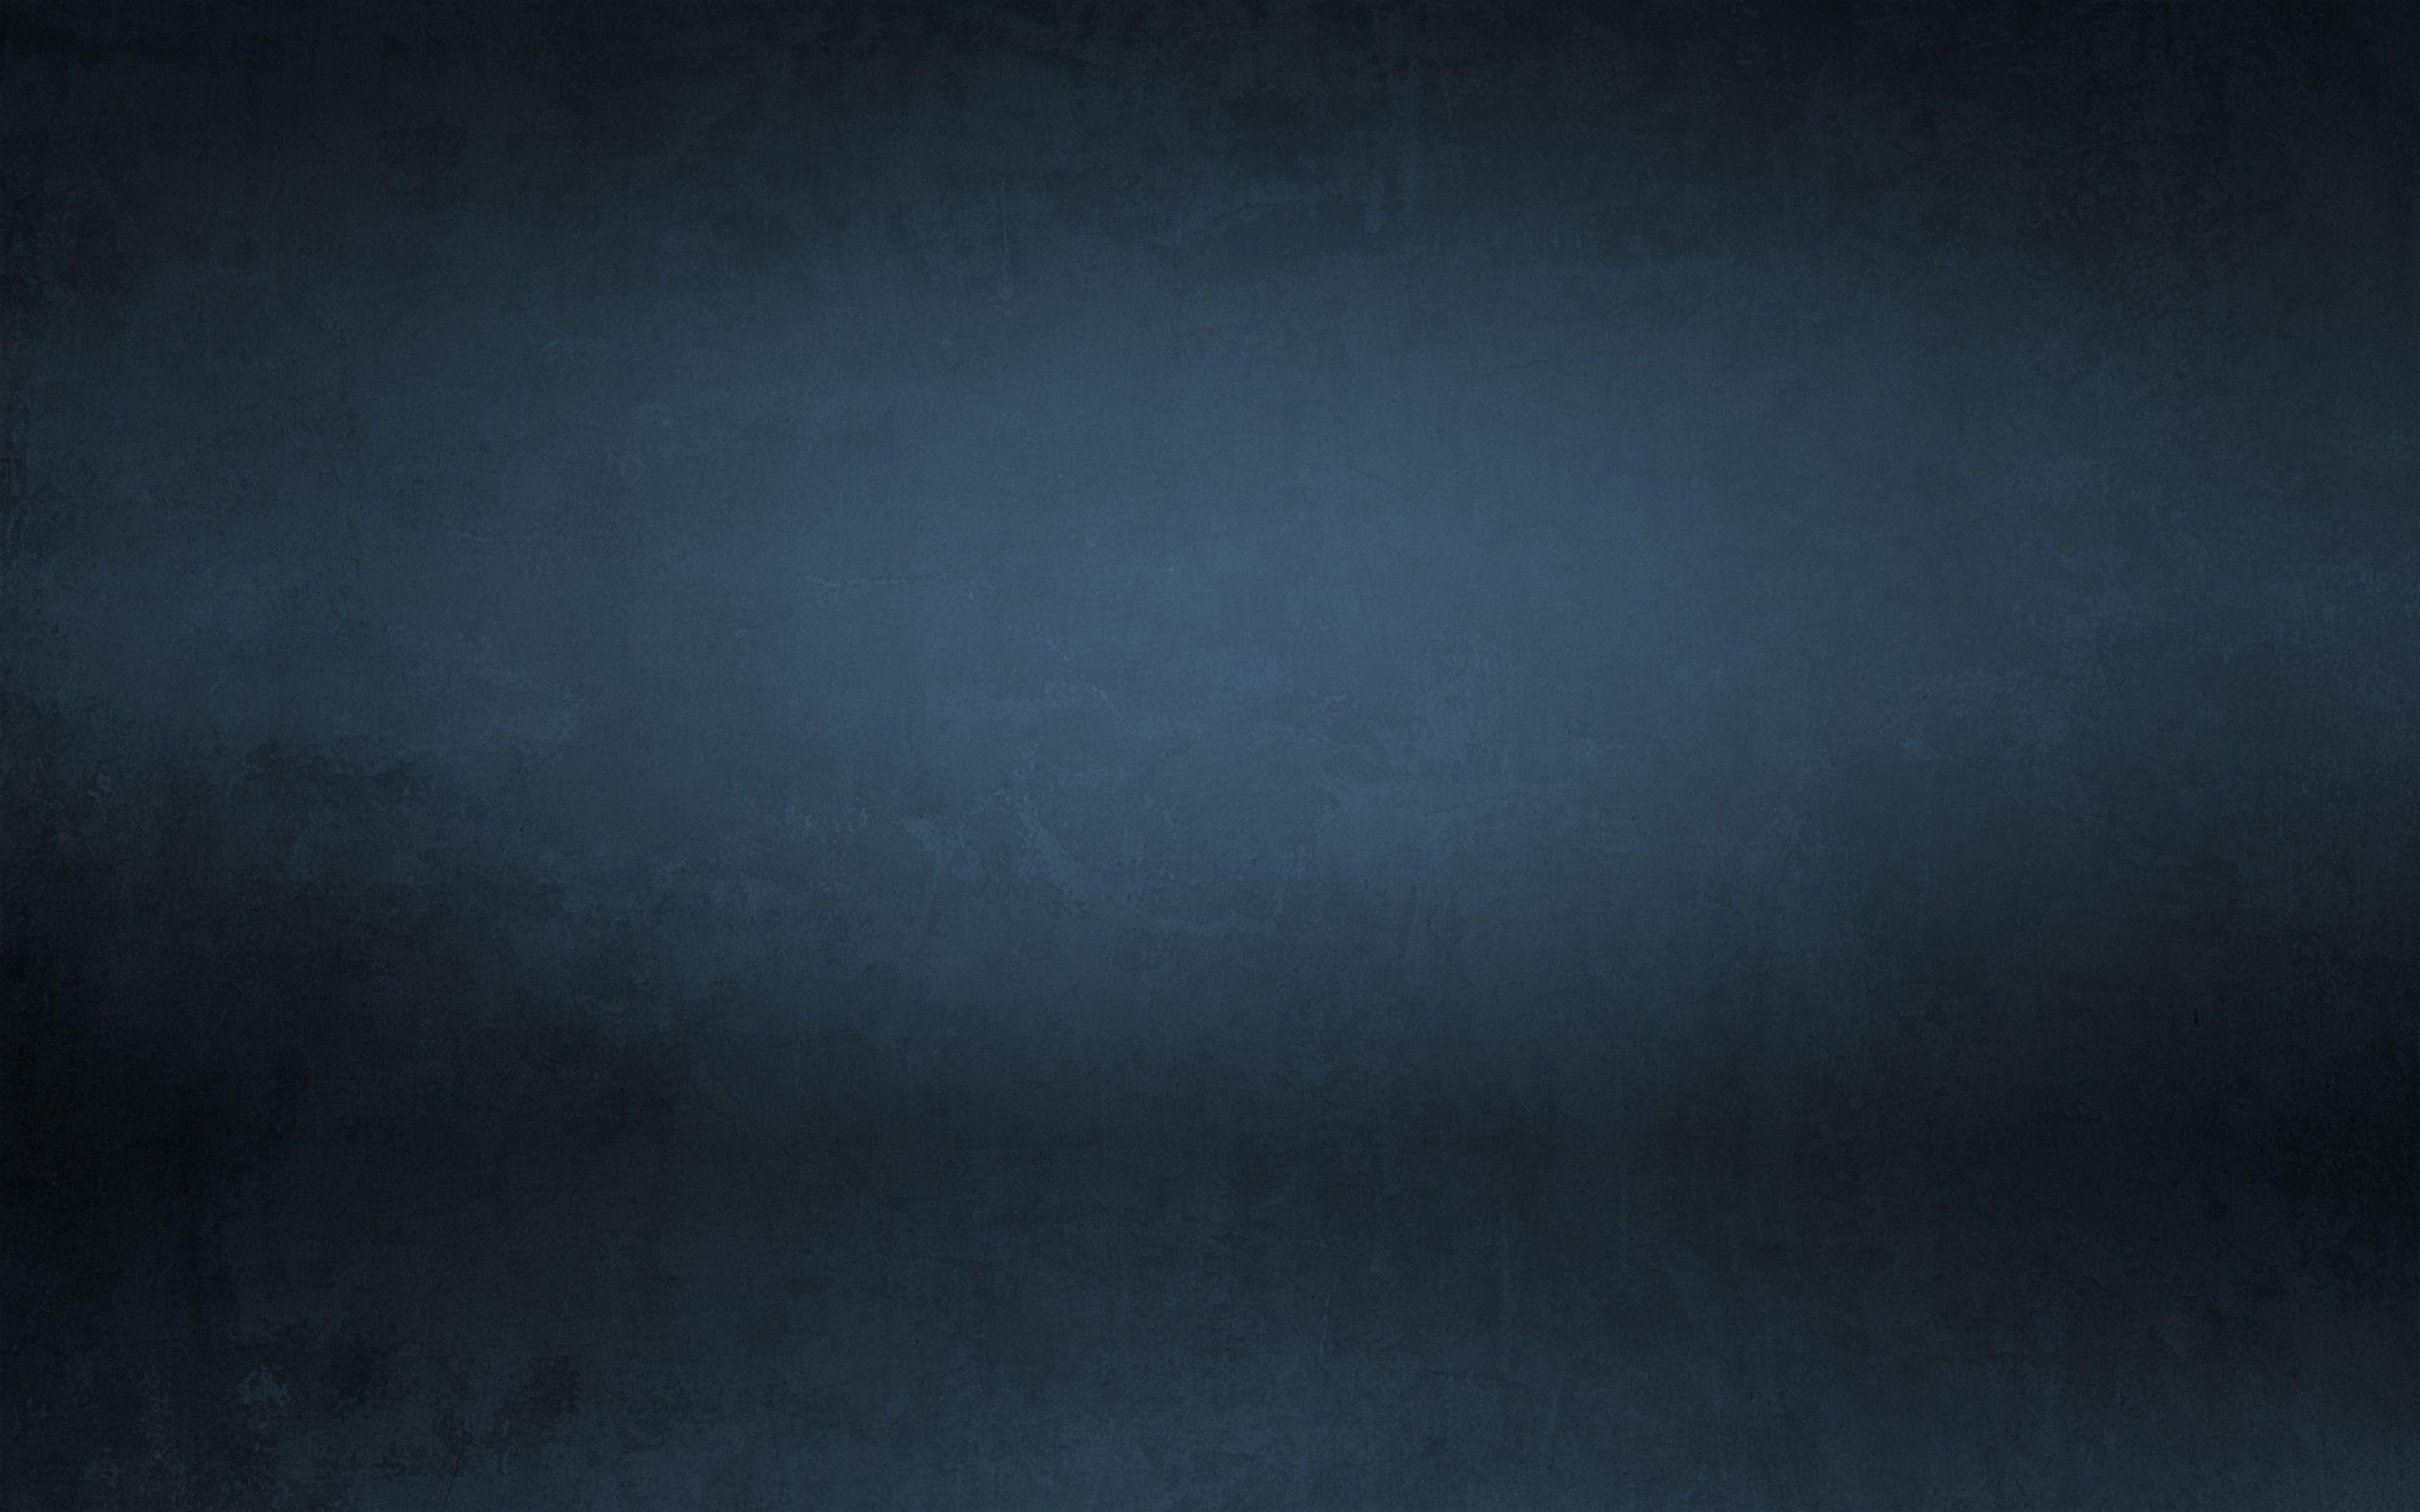 black darkblue light textures - photo #7